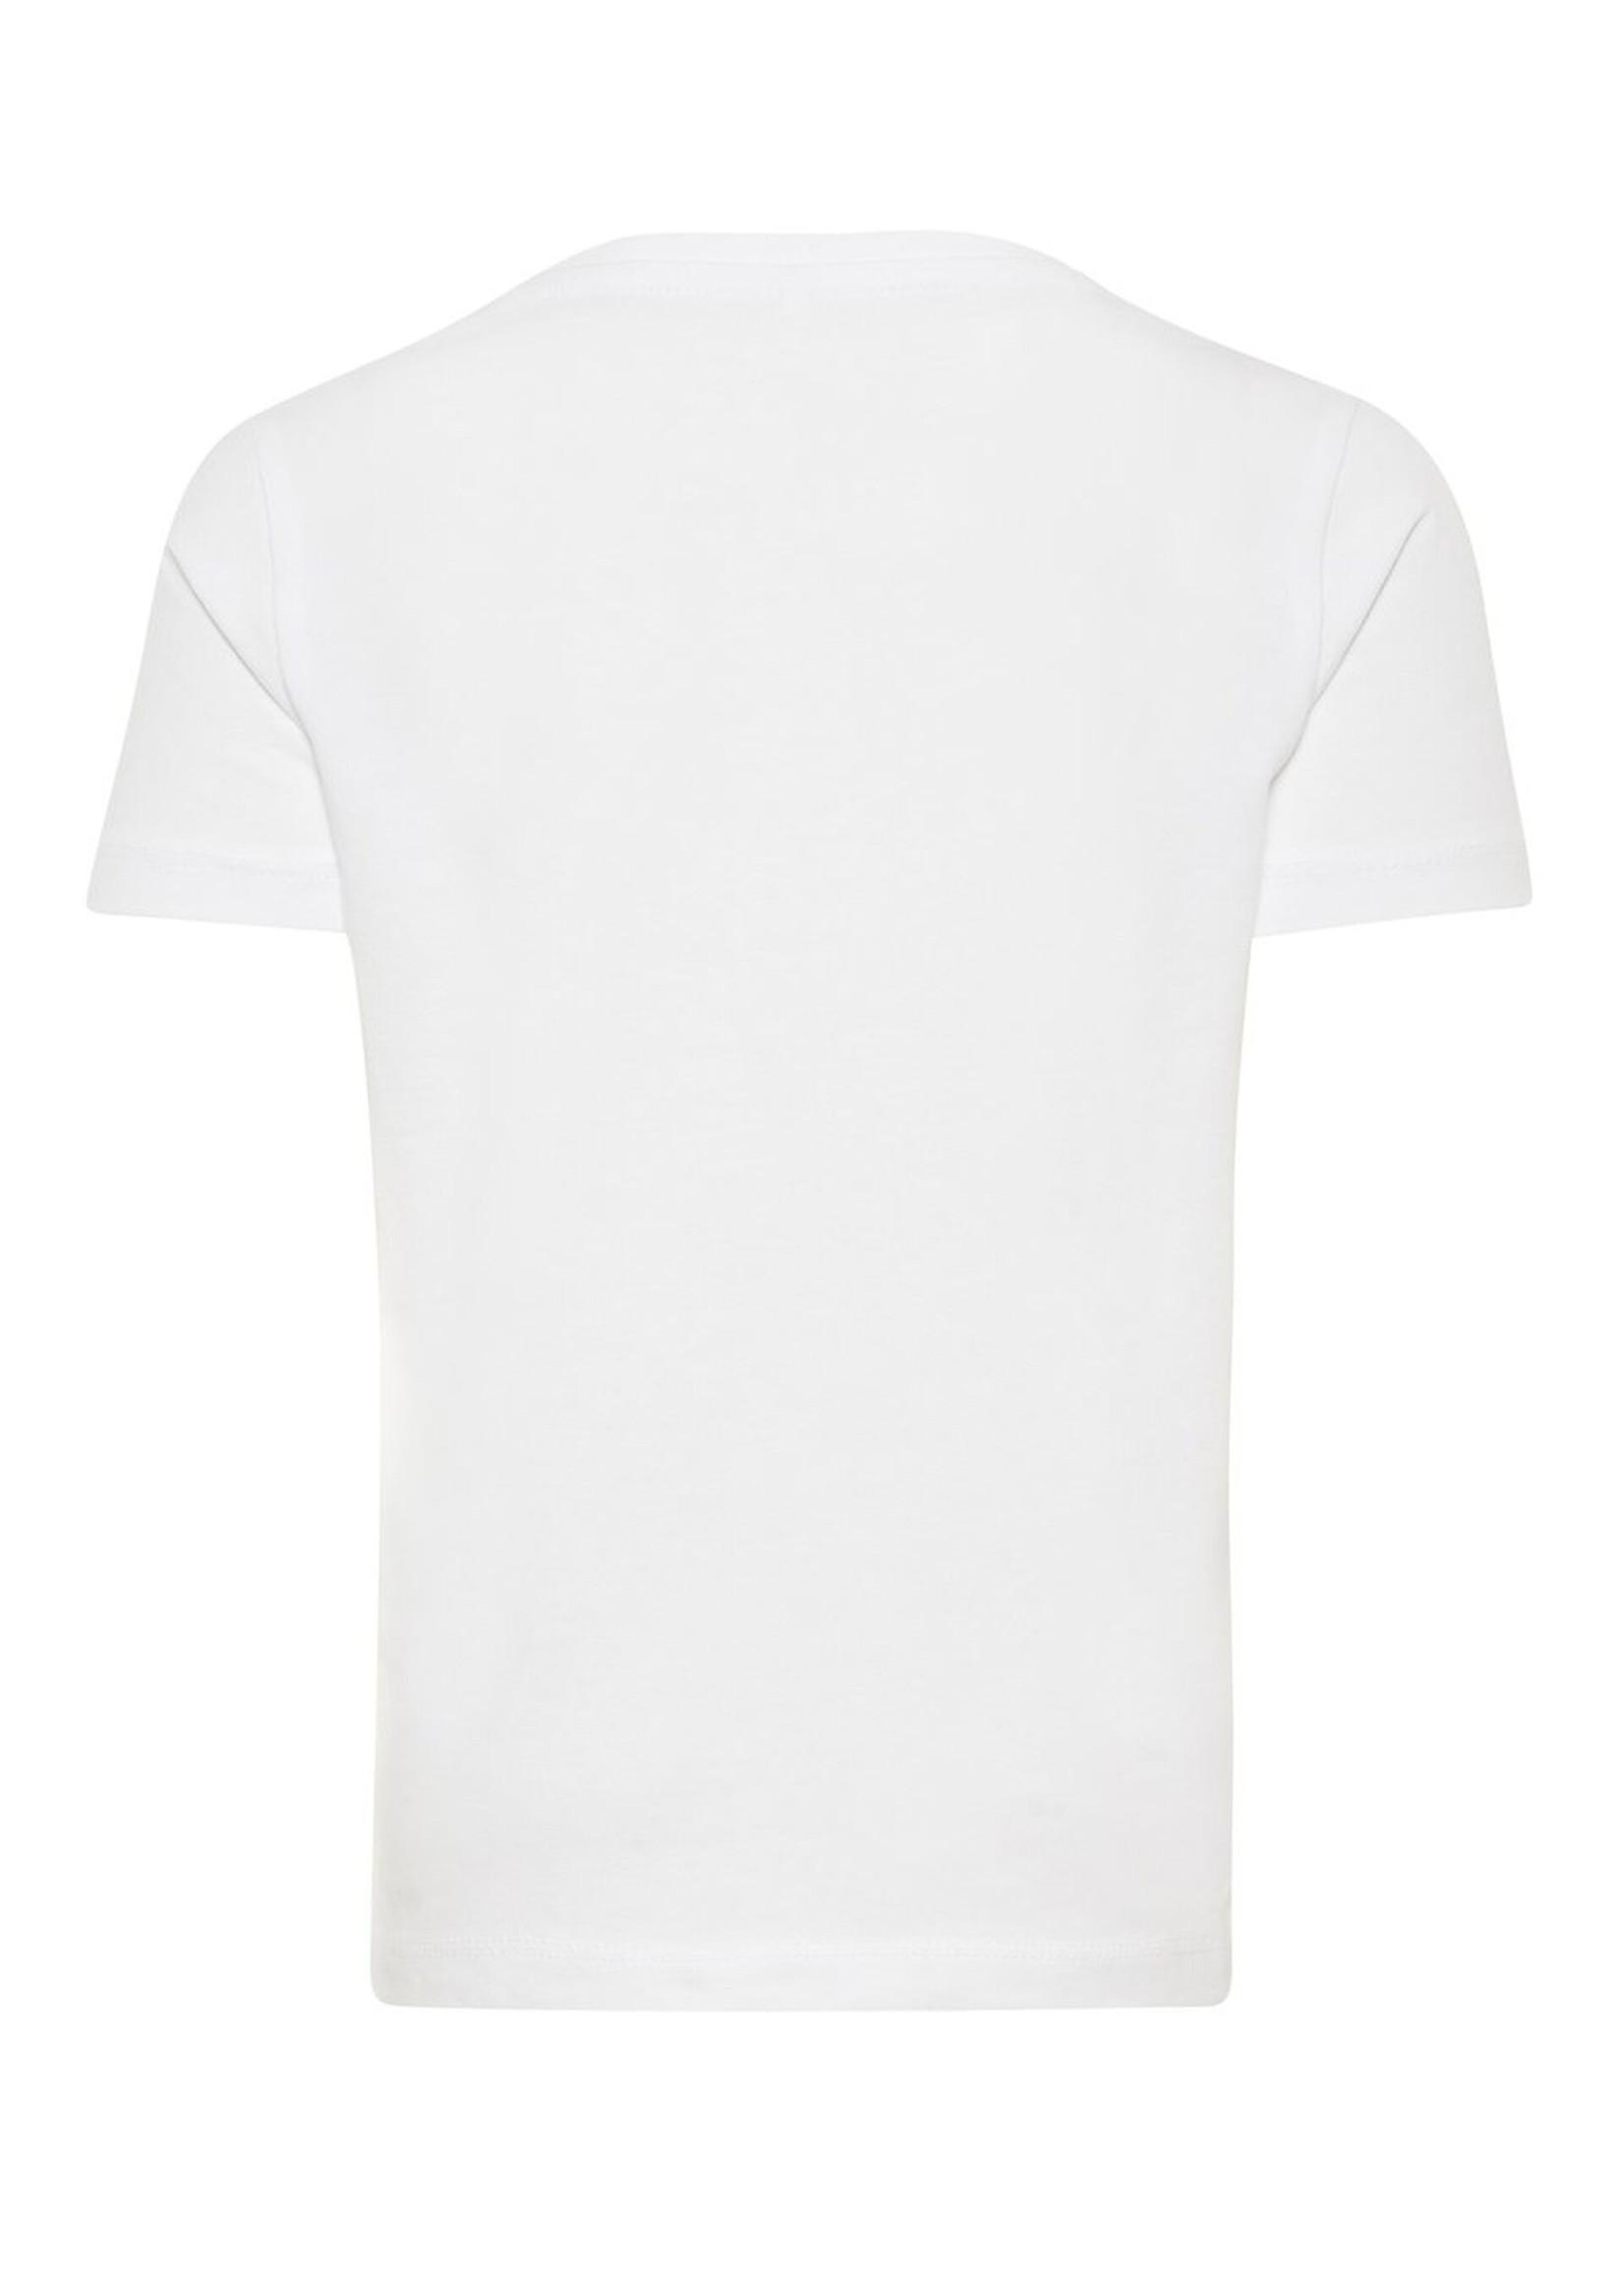 Name it T-shirt maat 80 + 92